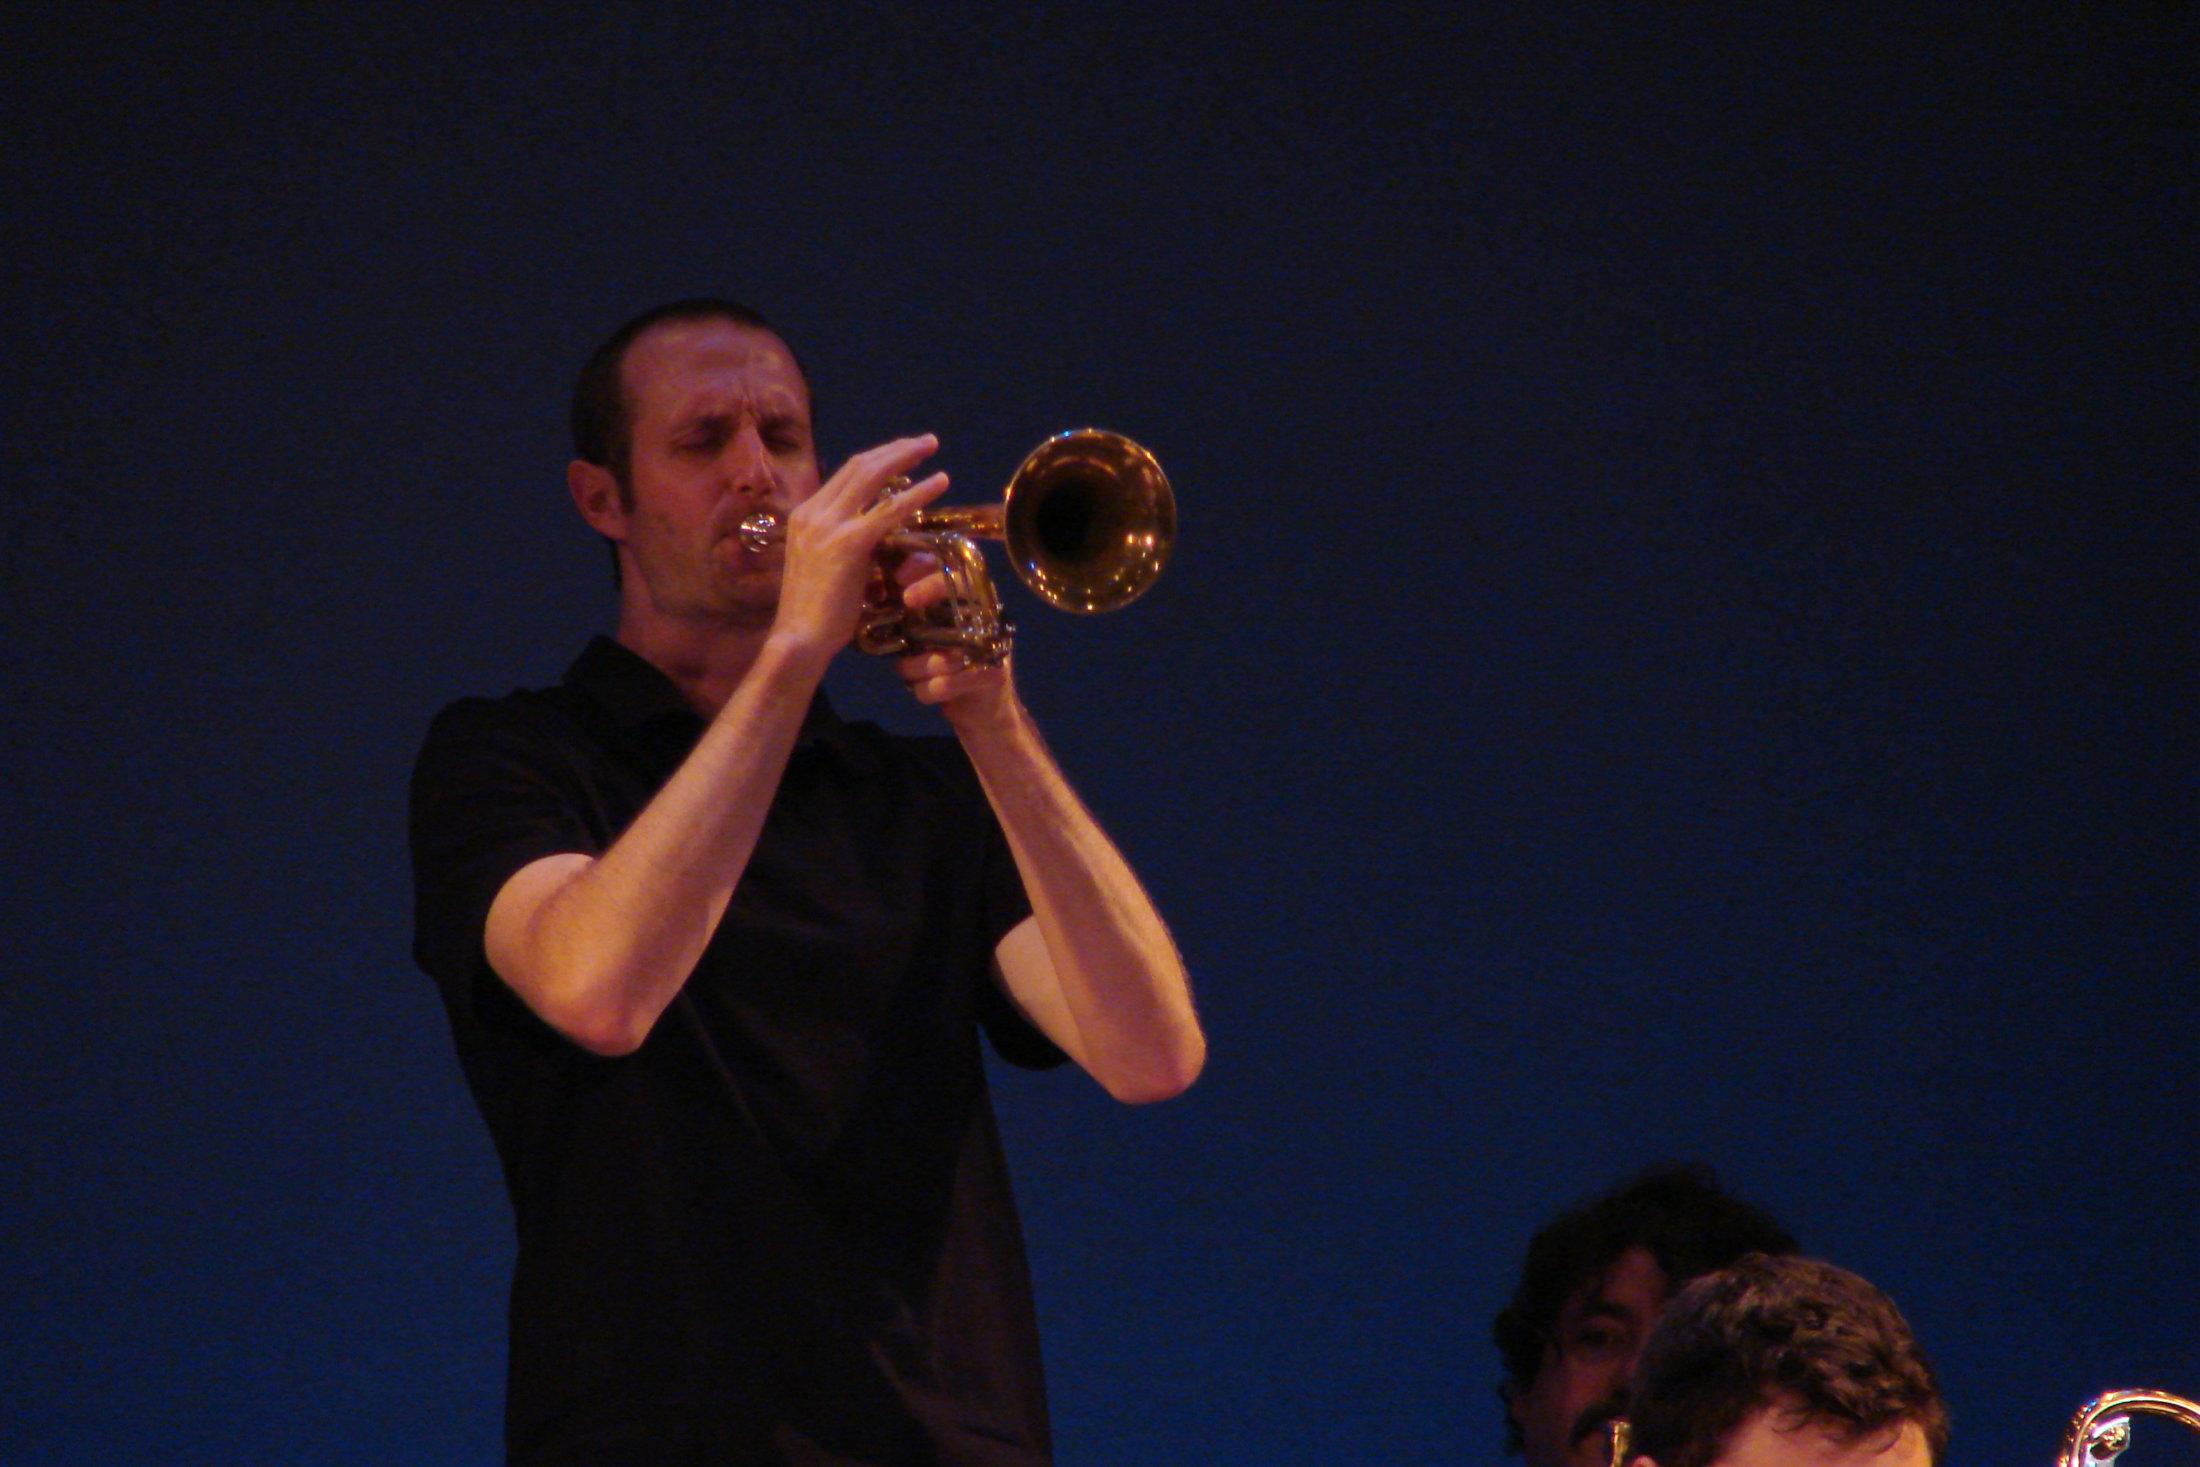 Nate Ekland